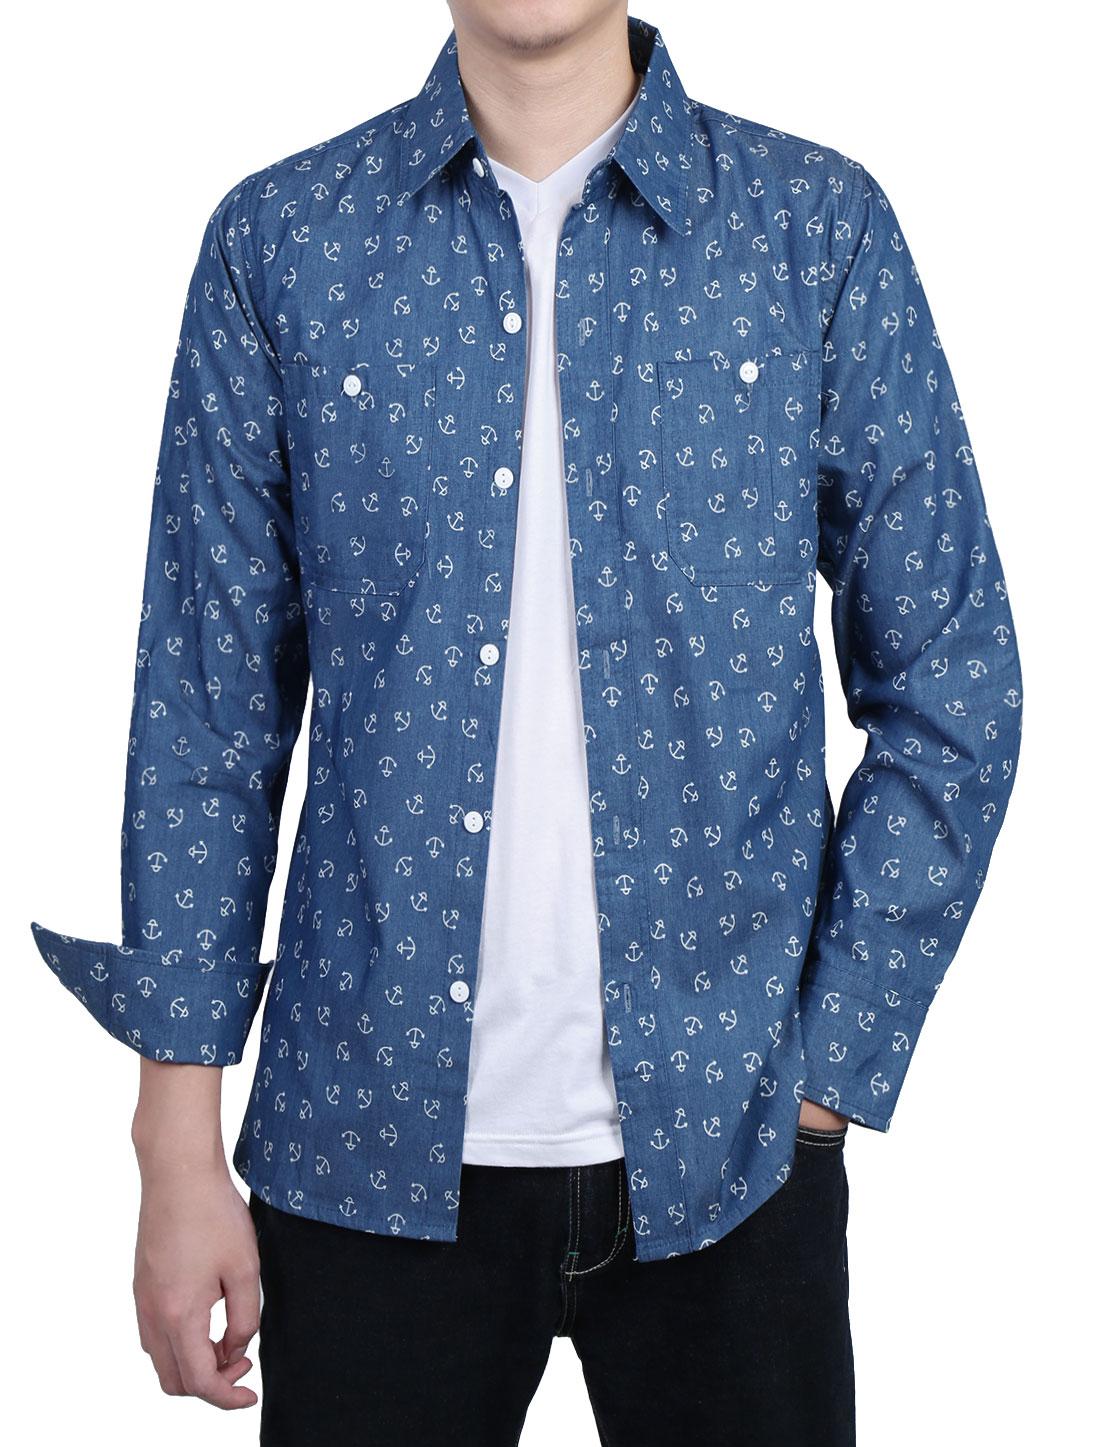 Men Long Sleeve Chest Pocket Anchor Print Button Down Shirt Navy Blue S